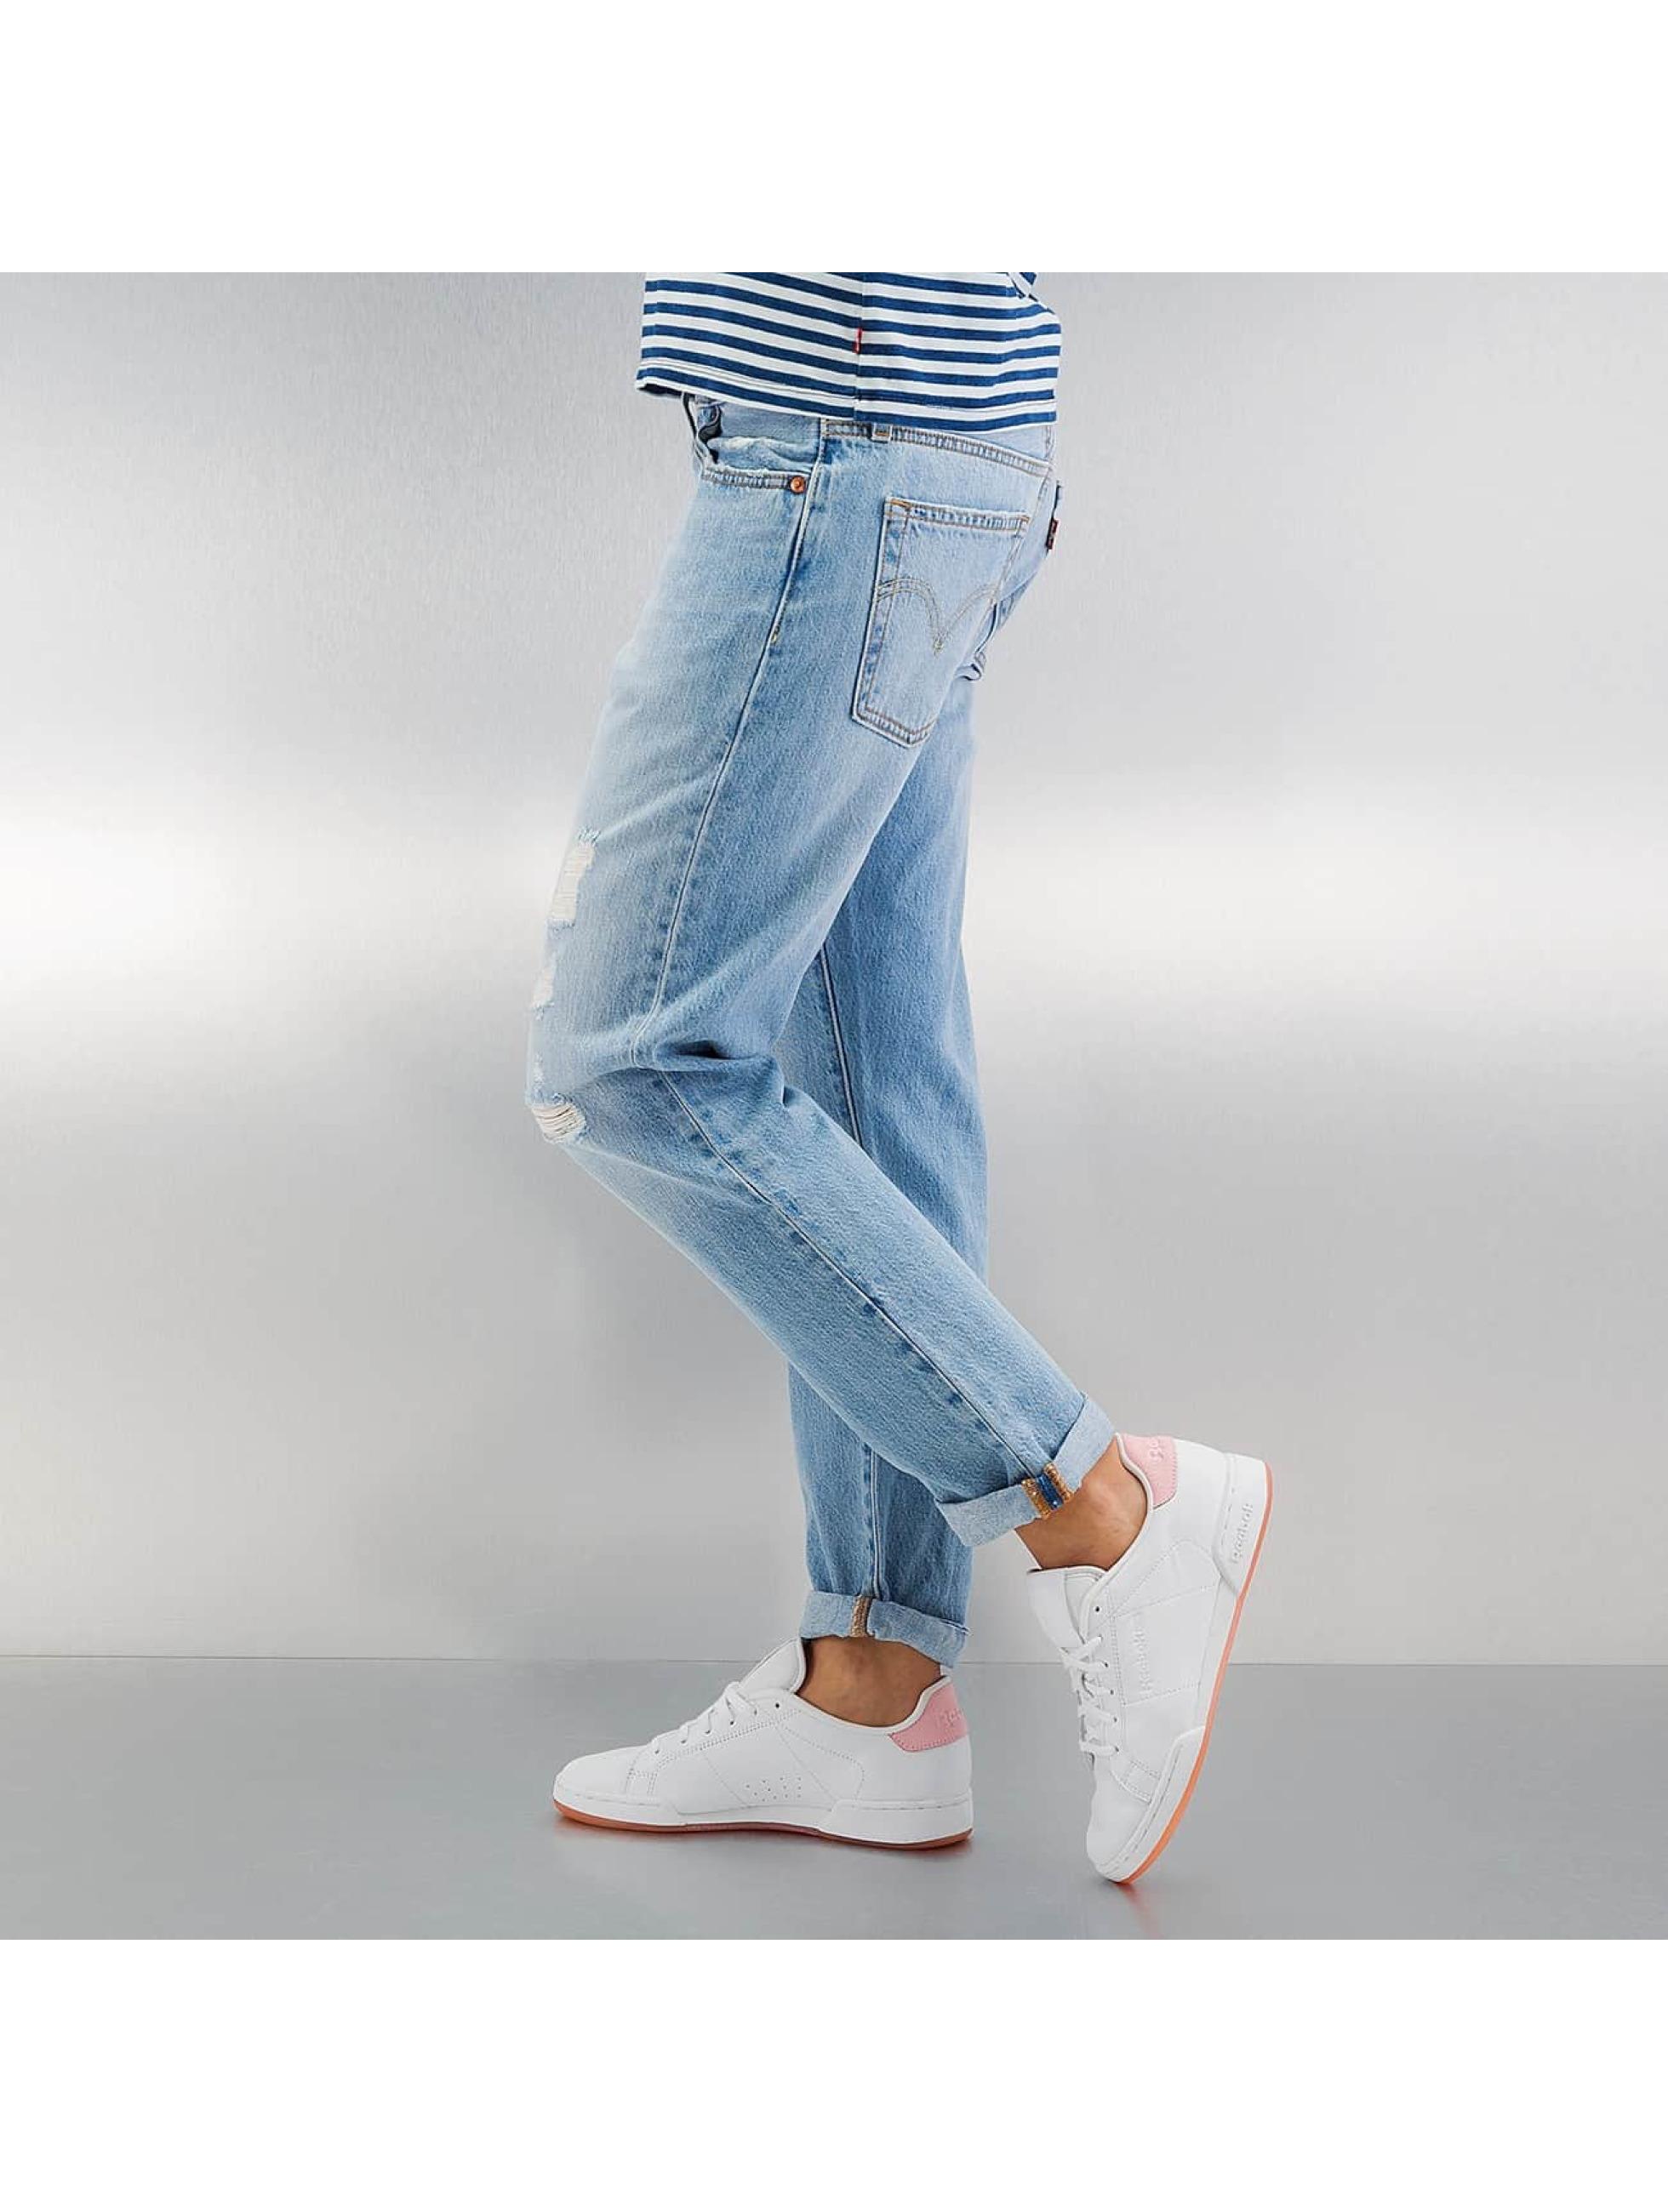 Levi's® Loose Fit Jeans Turbulent blue